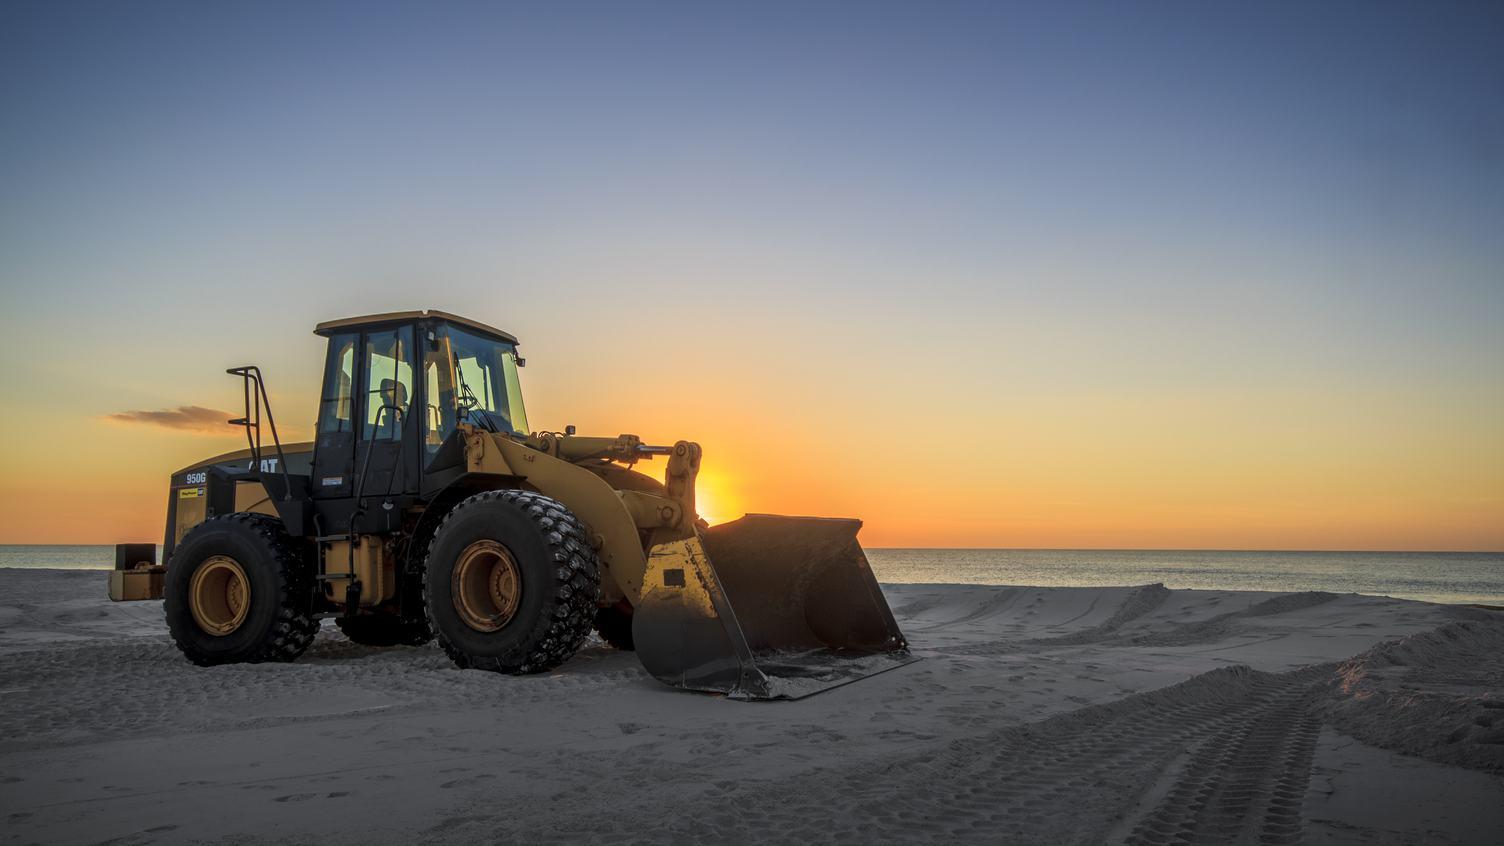 Yellow Bulldozer on the Beach